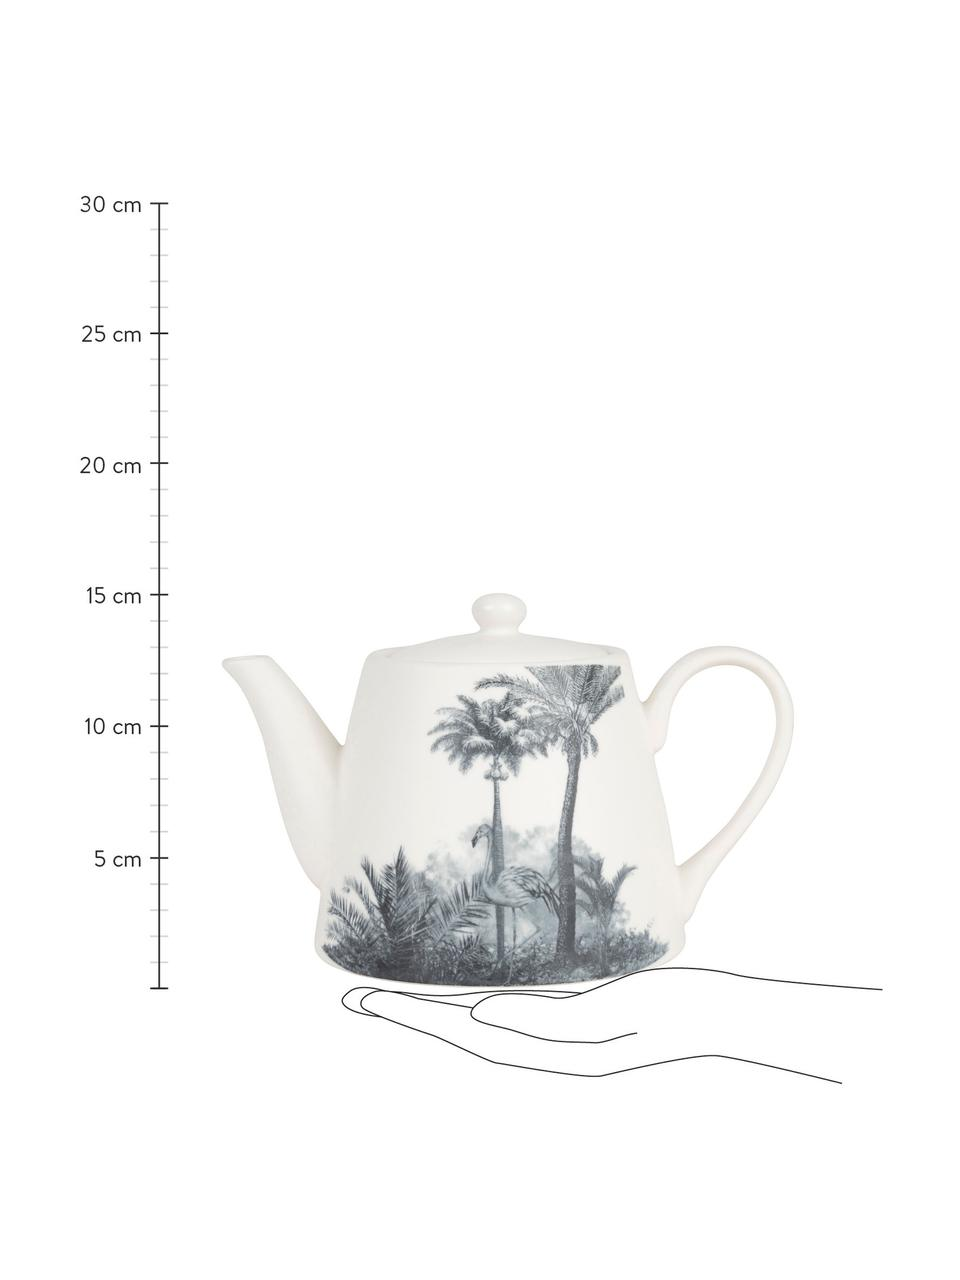 Teekanne Papaye mit Palmenmotiven, Porzellan, Weiß, Schwarz, 850 ml